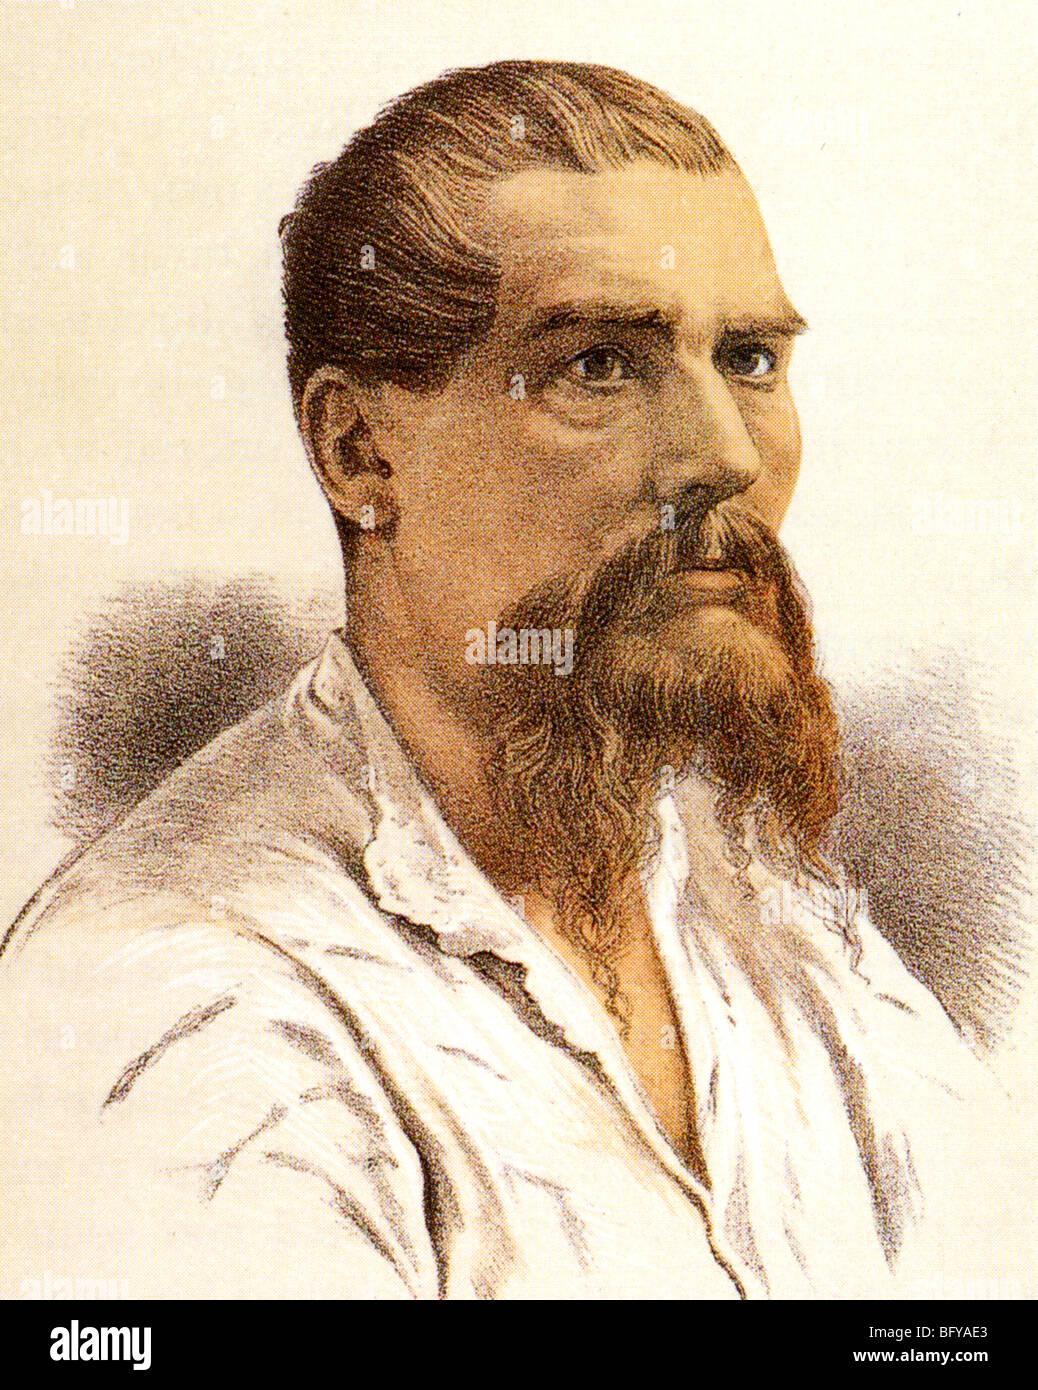 SIR RICHARD FRANCIS BURTON  English explorer, linguist and diplomat  (1821-90) - Stock Image